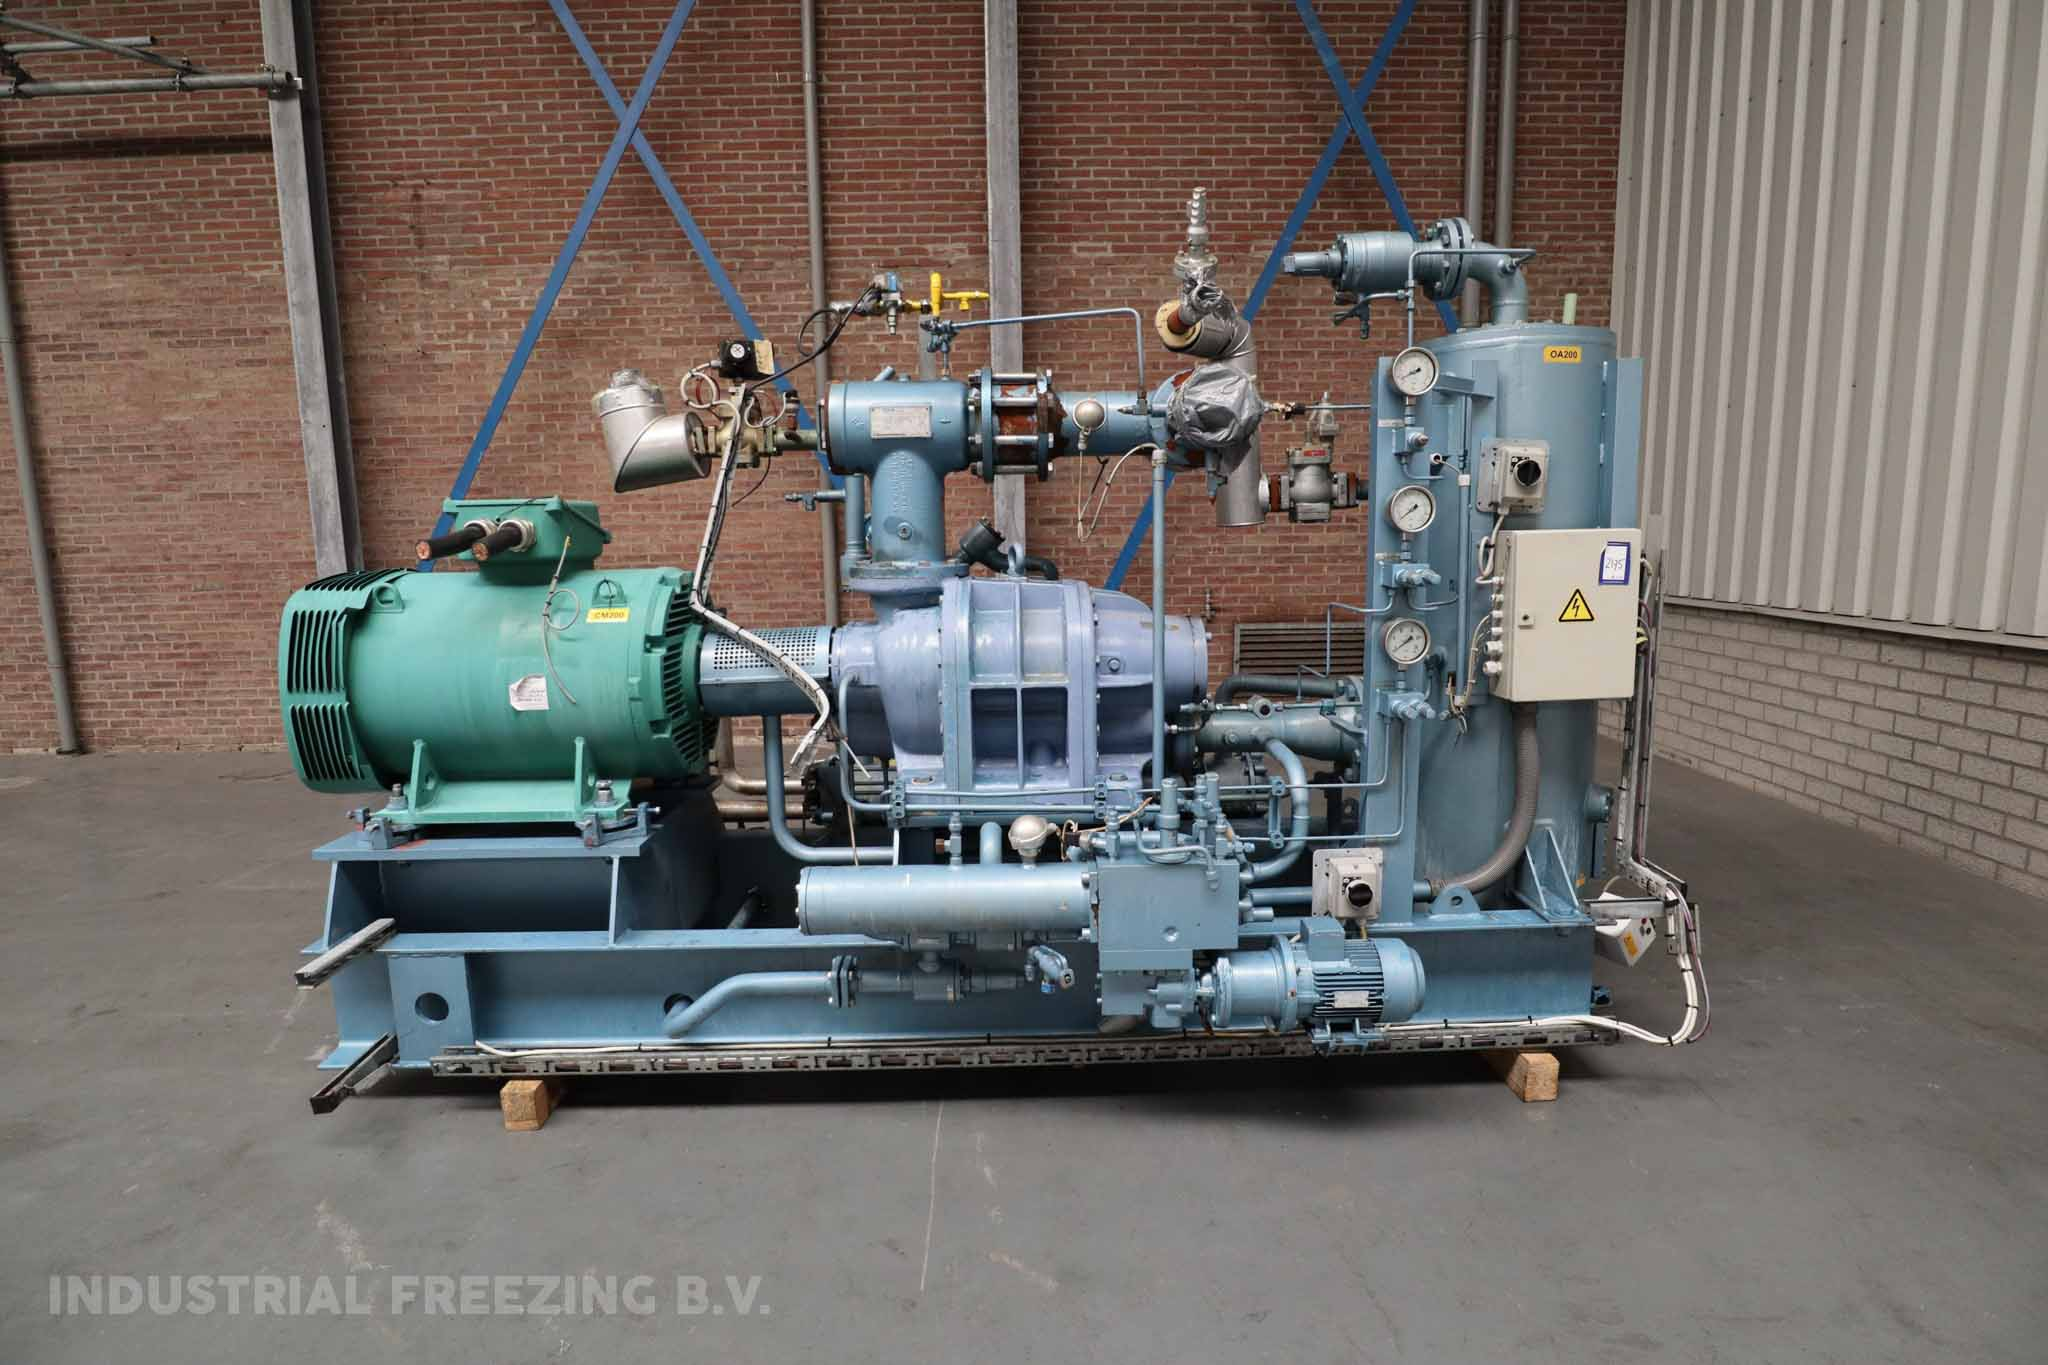 GEA Grasso SR-S48S-28 Cooling Compressor